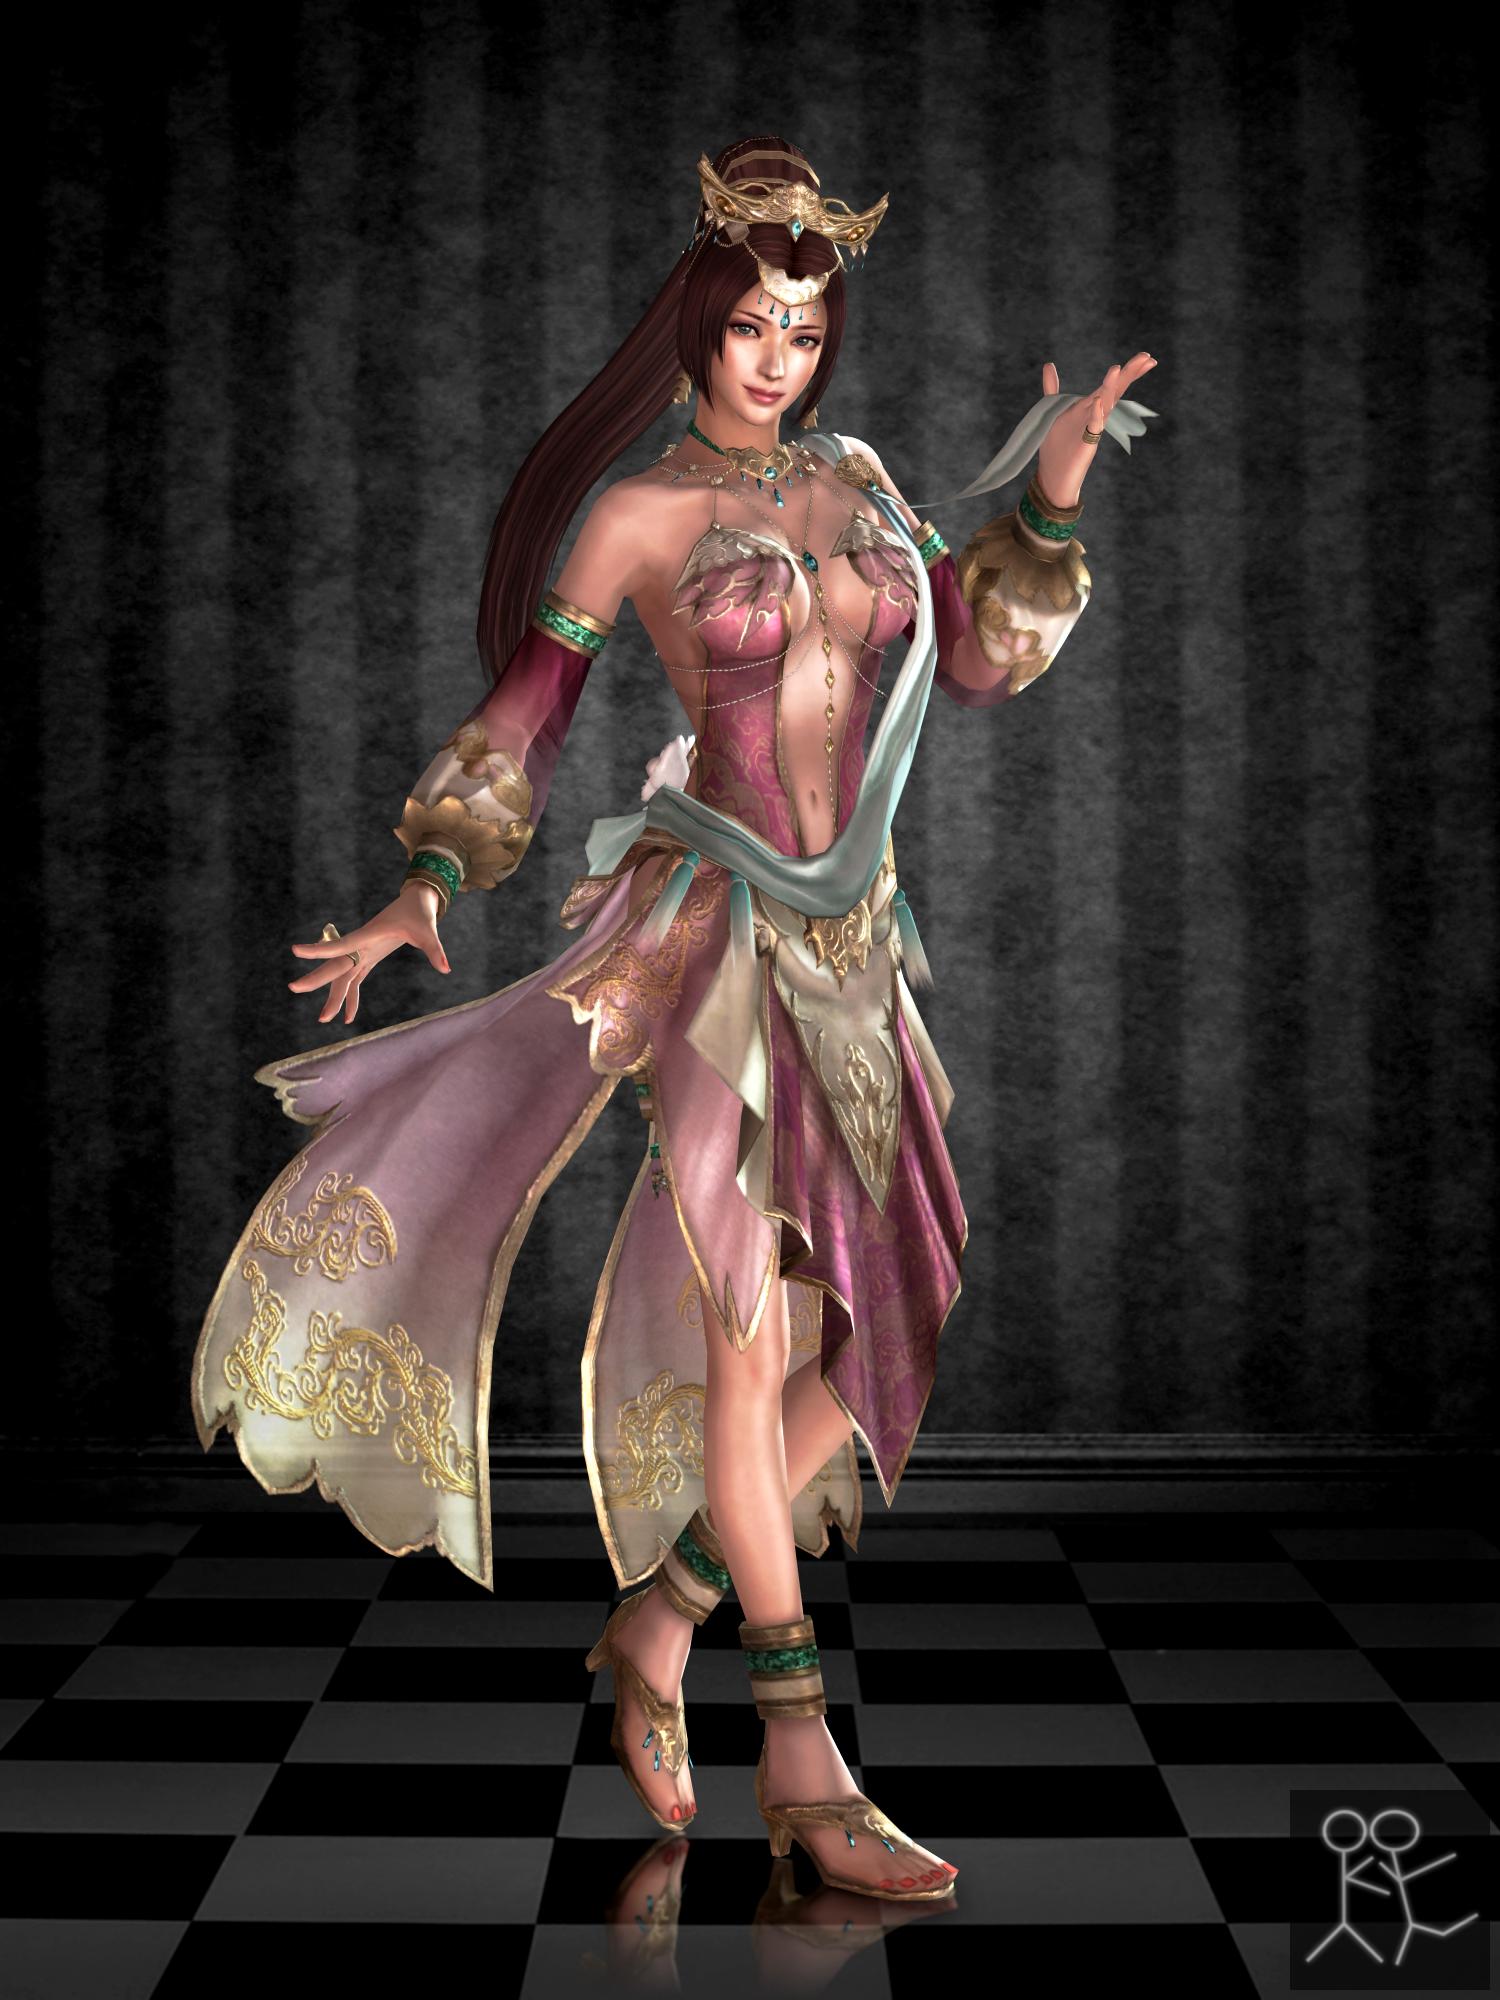 Dynasty Warriors 8 Diaochan By Sticklove On Deviantart Dynasty Warriors Dynasty Warriors Characters Female Elf